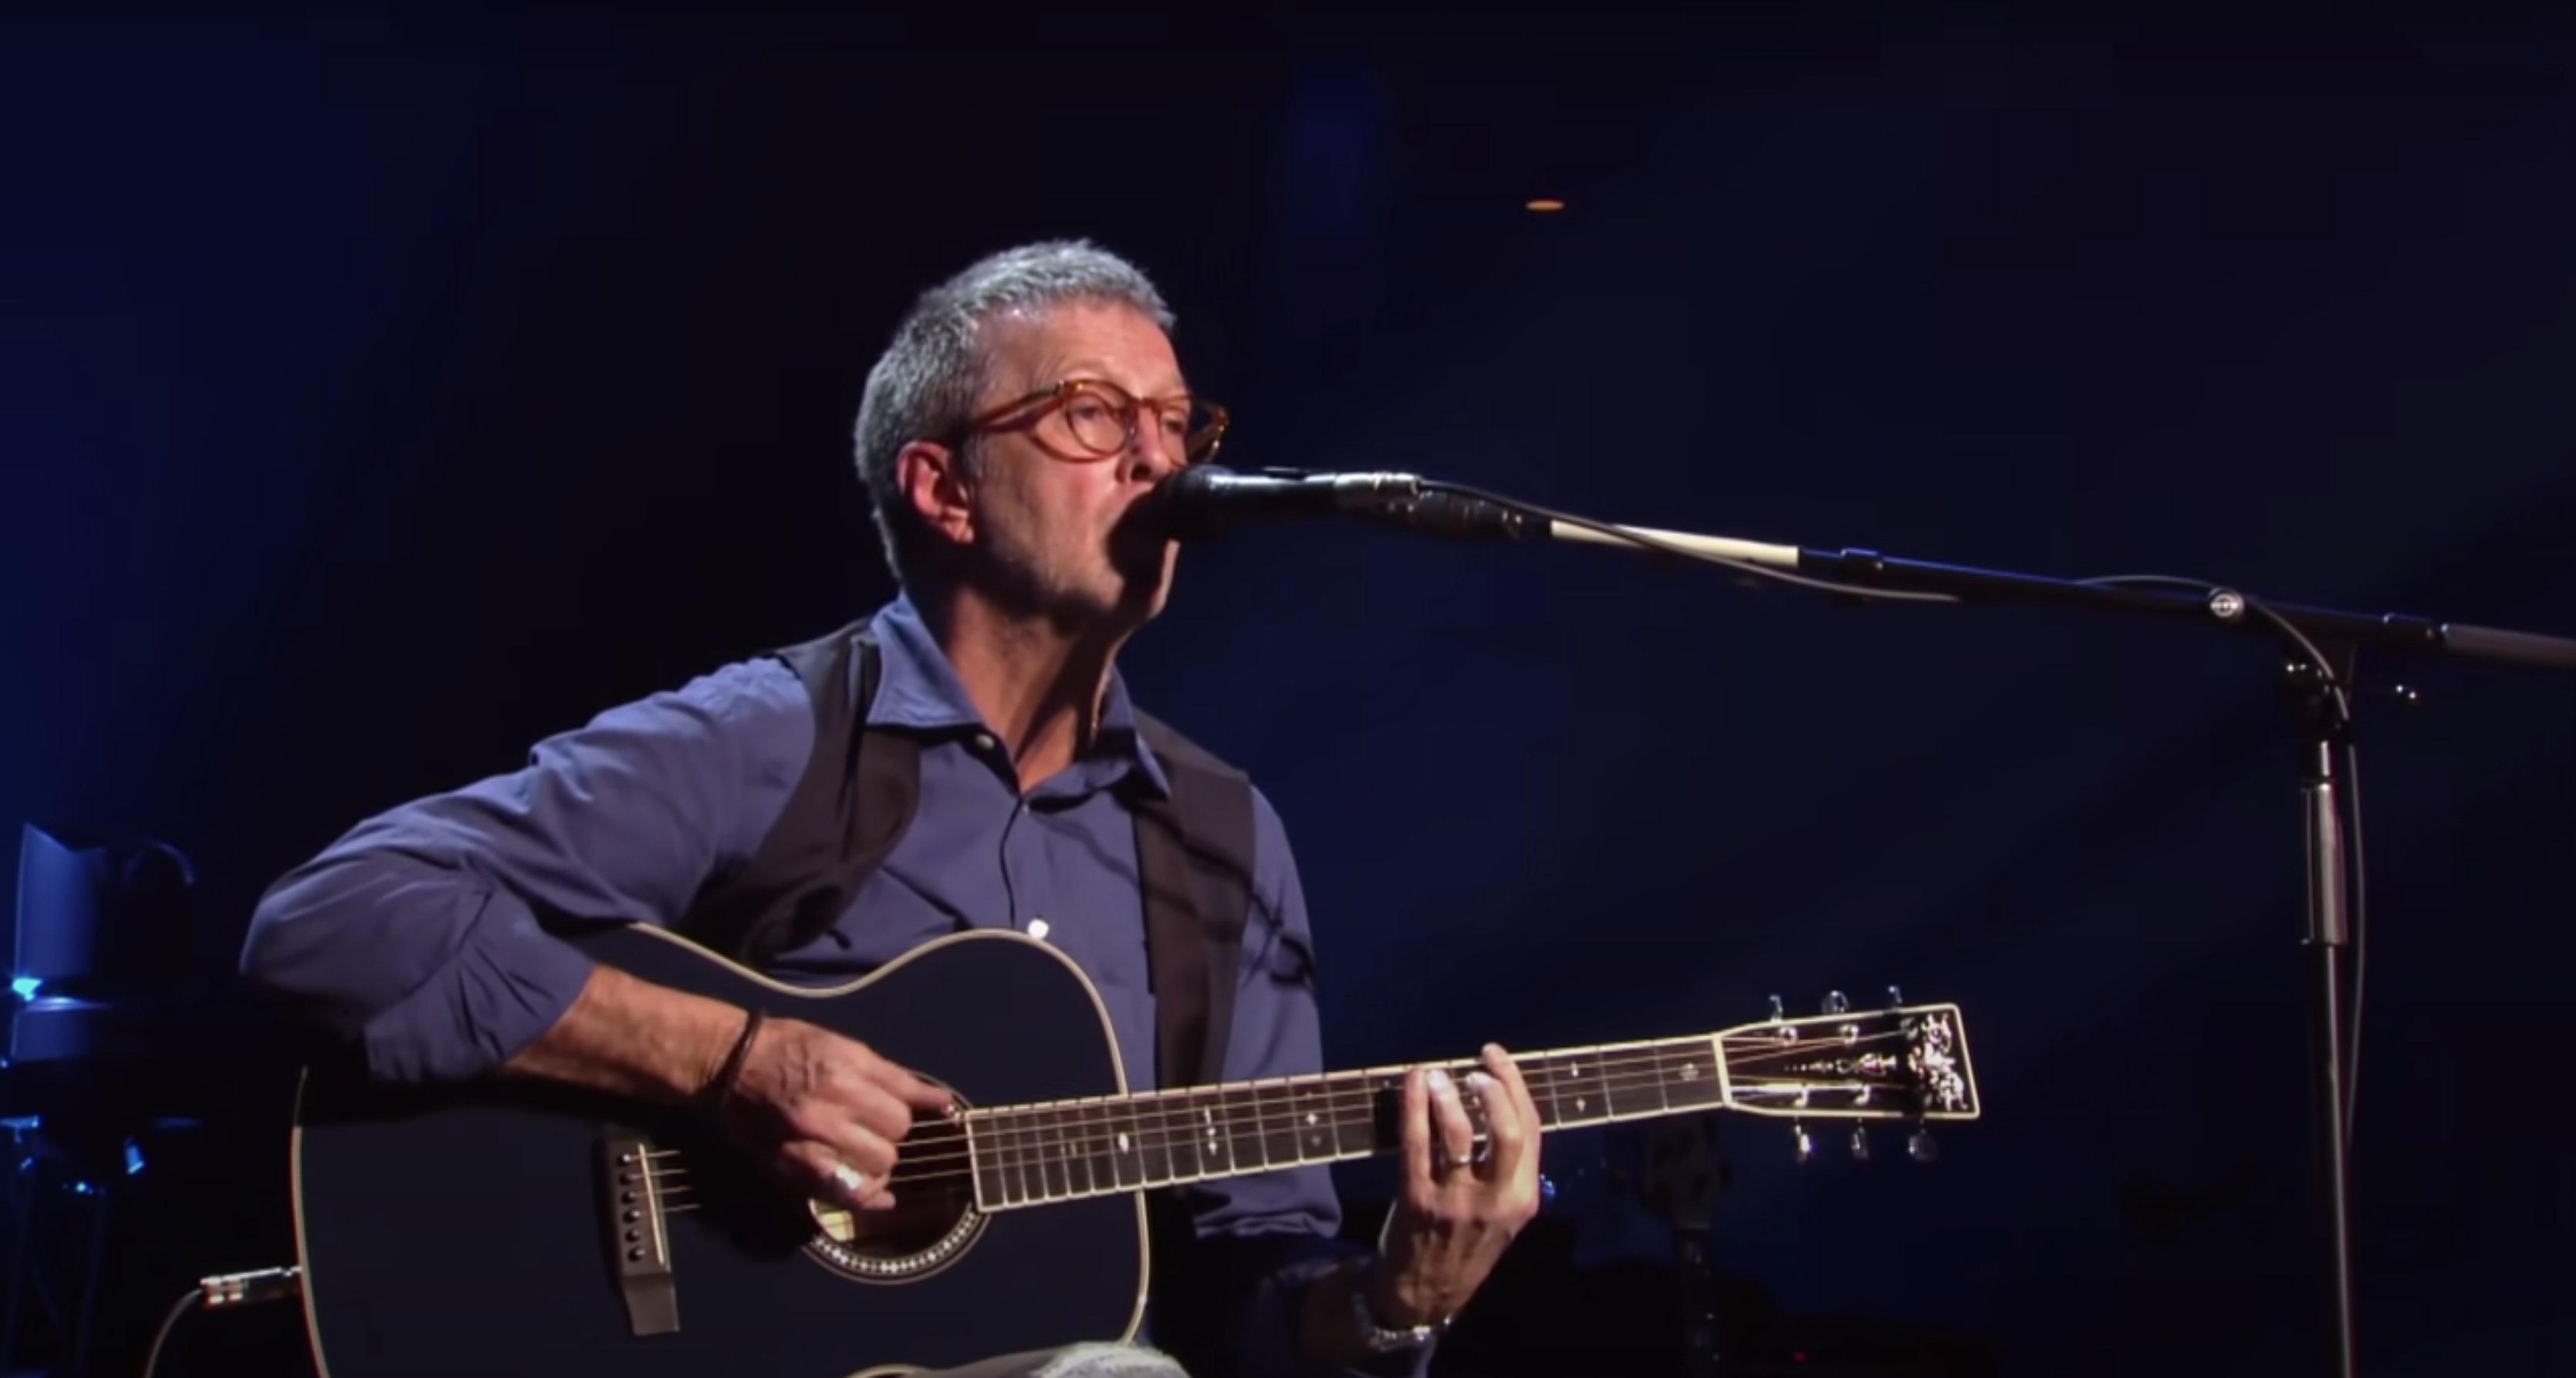 Extra concert Eric Clapton in Ziggo Dome